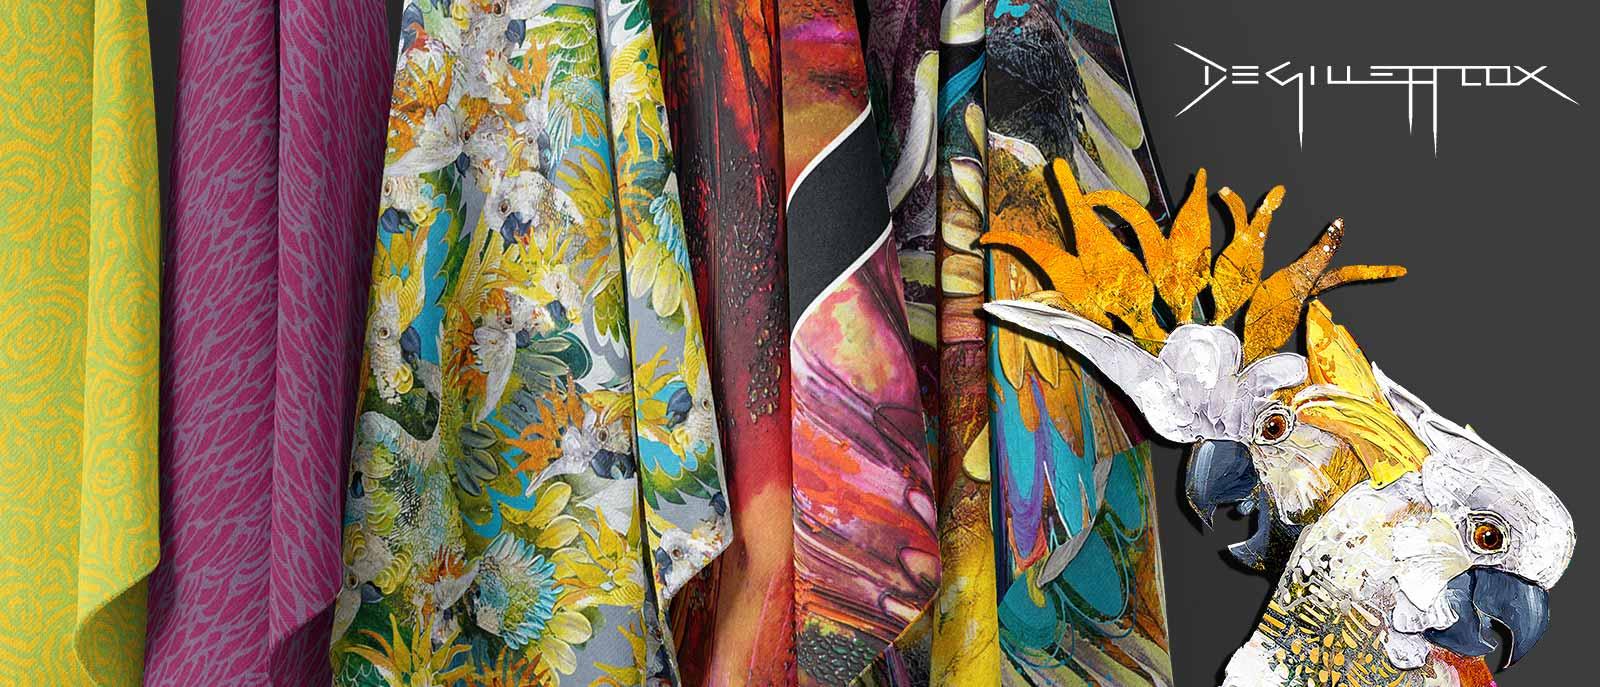 Hanging Fabric Mockup Cockatoo Chatter Blog Header